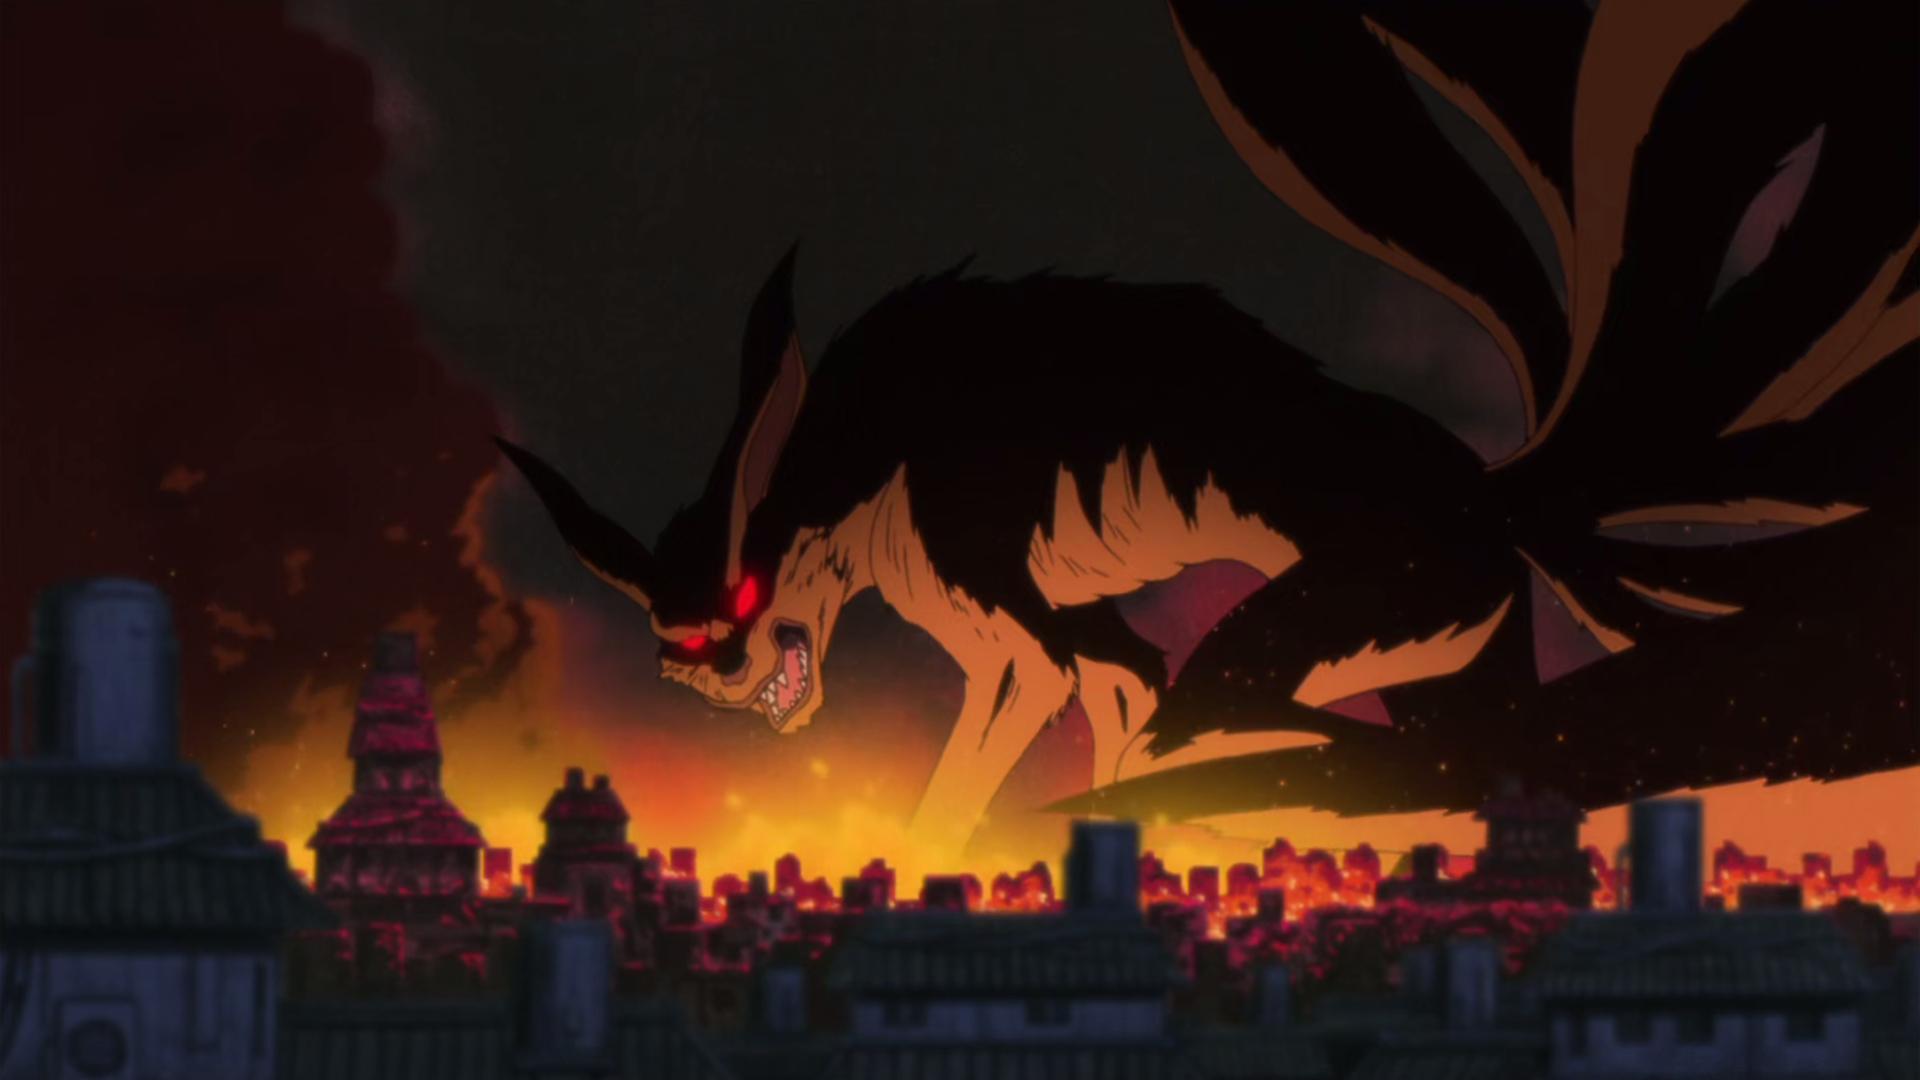 Kurama | Narutopedia | FANDOM powered by Wikia